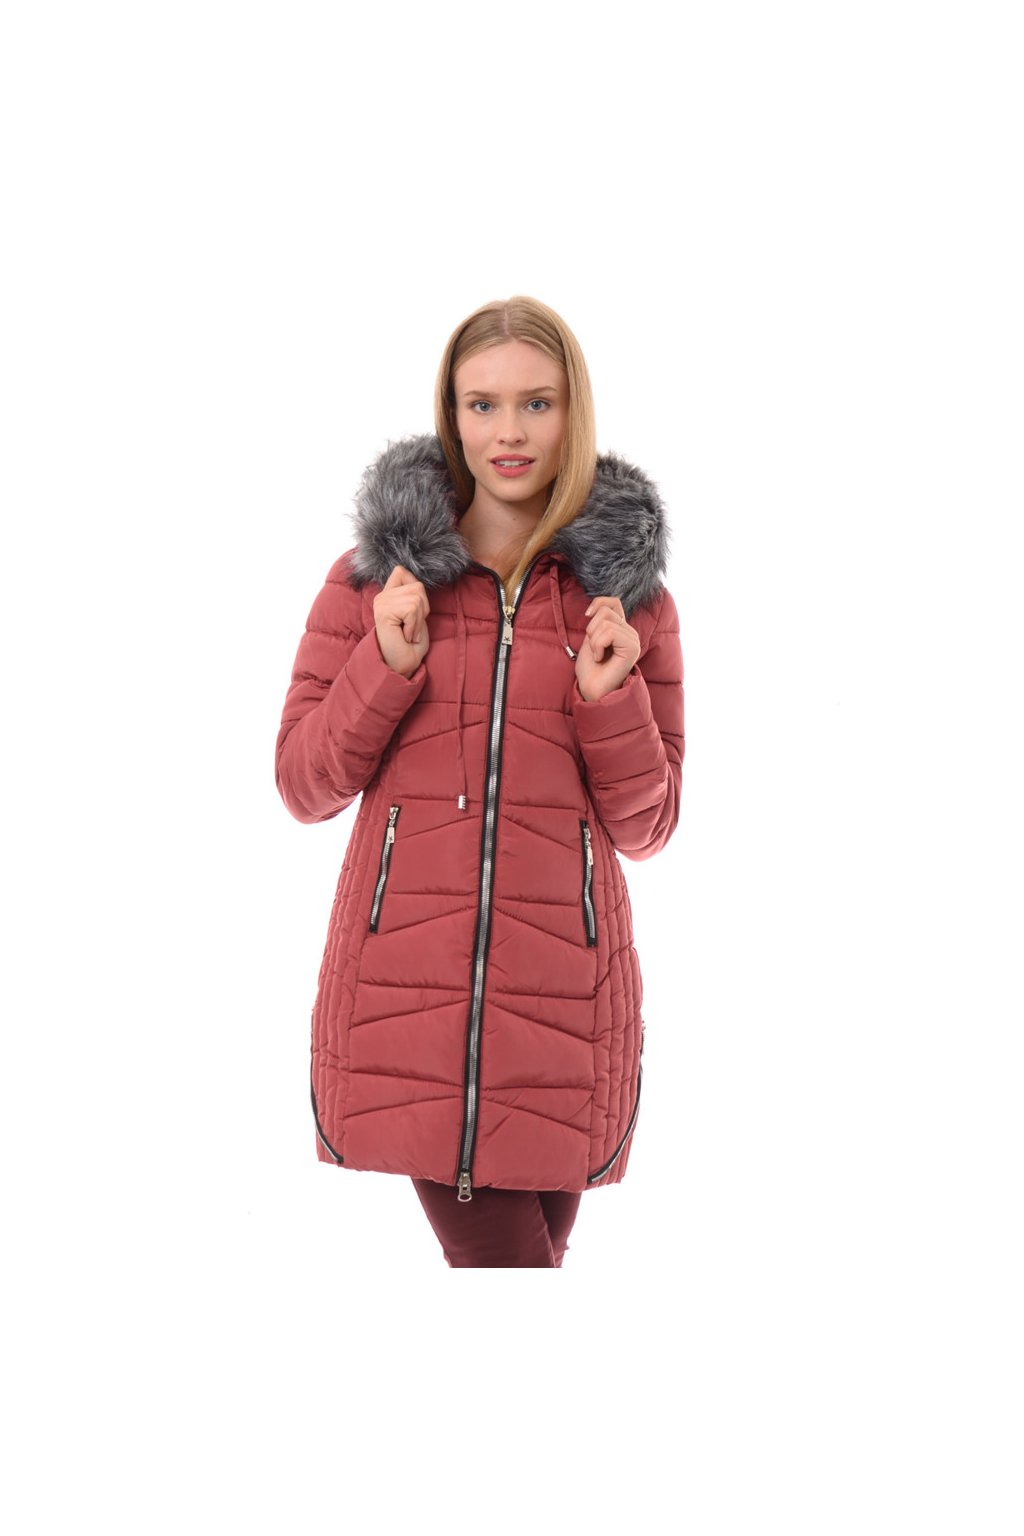 Dámska zimná bunda s kožušinou 3531 ružová